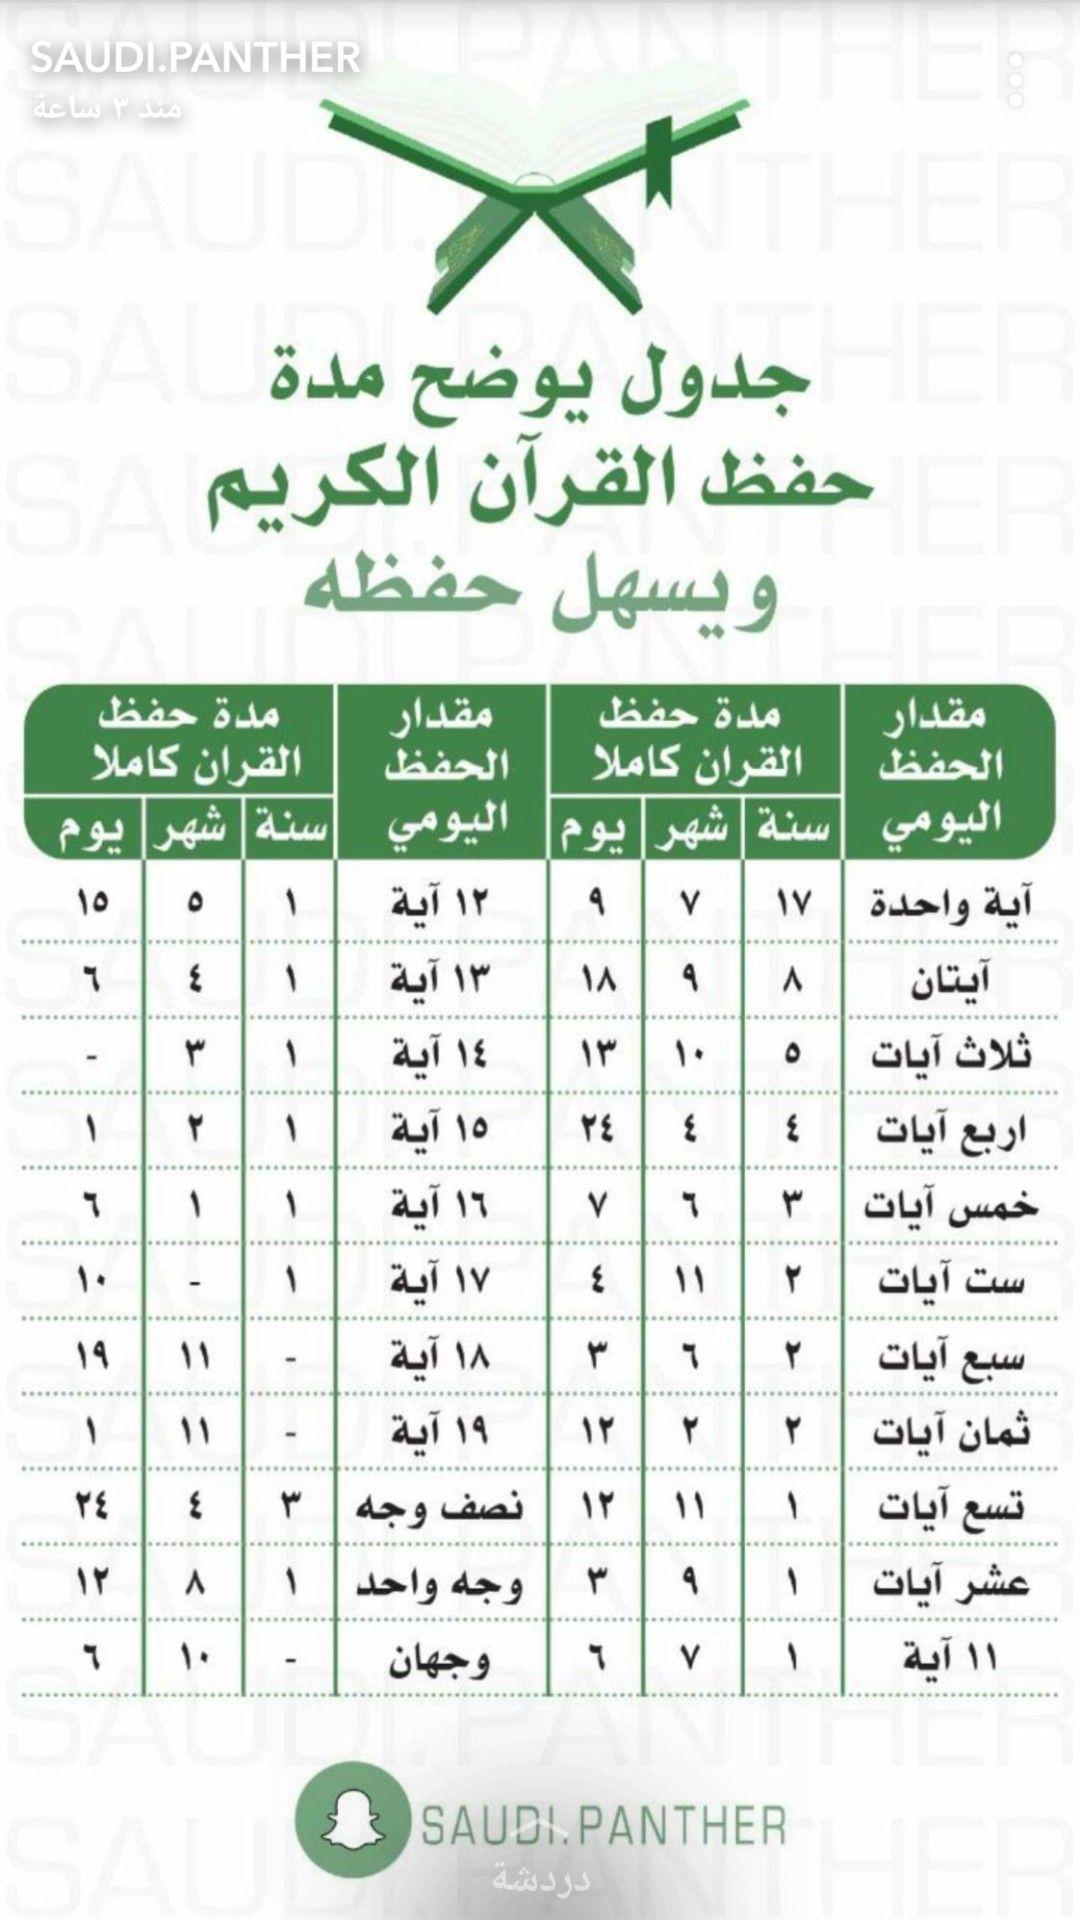 حفظ القرءان Islamic Quotes Quran Islam Facts Islam Beliefs